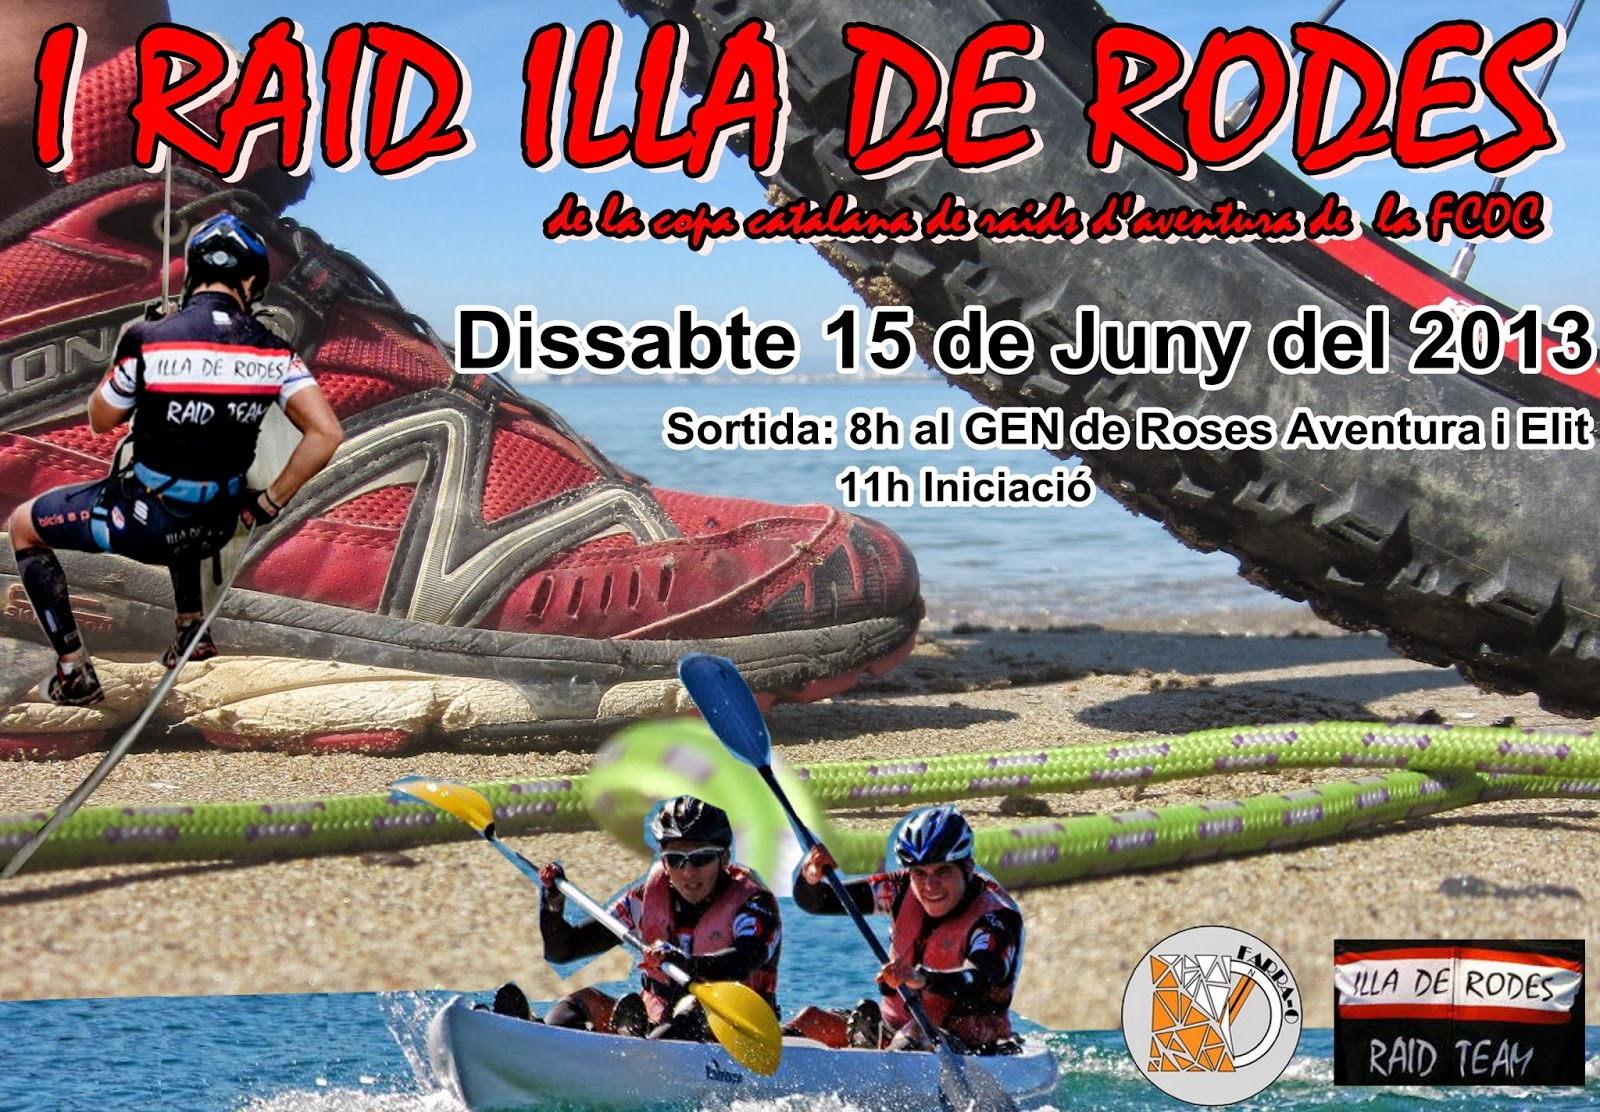 http://raidilladerodes.blogspot.com.es/